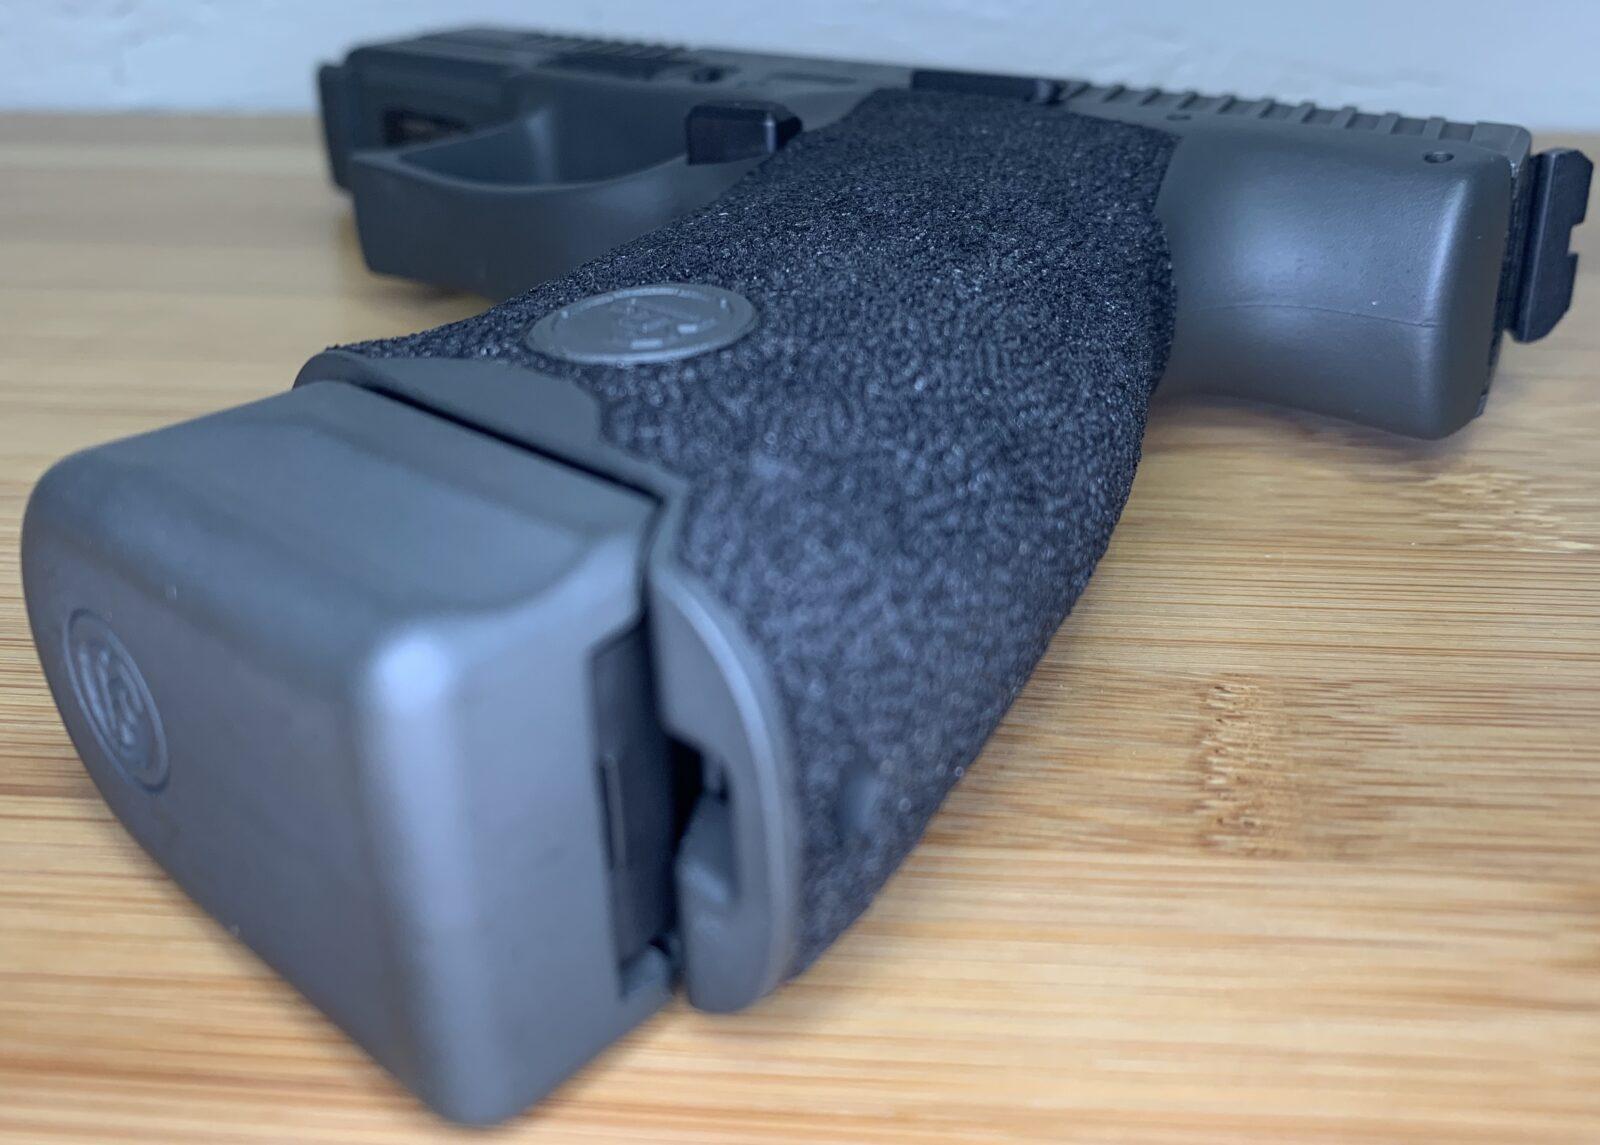 Apex Tactical Specialties CZ P10c Magazine Release - Range Hot